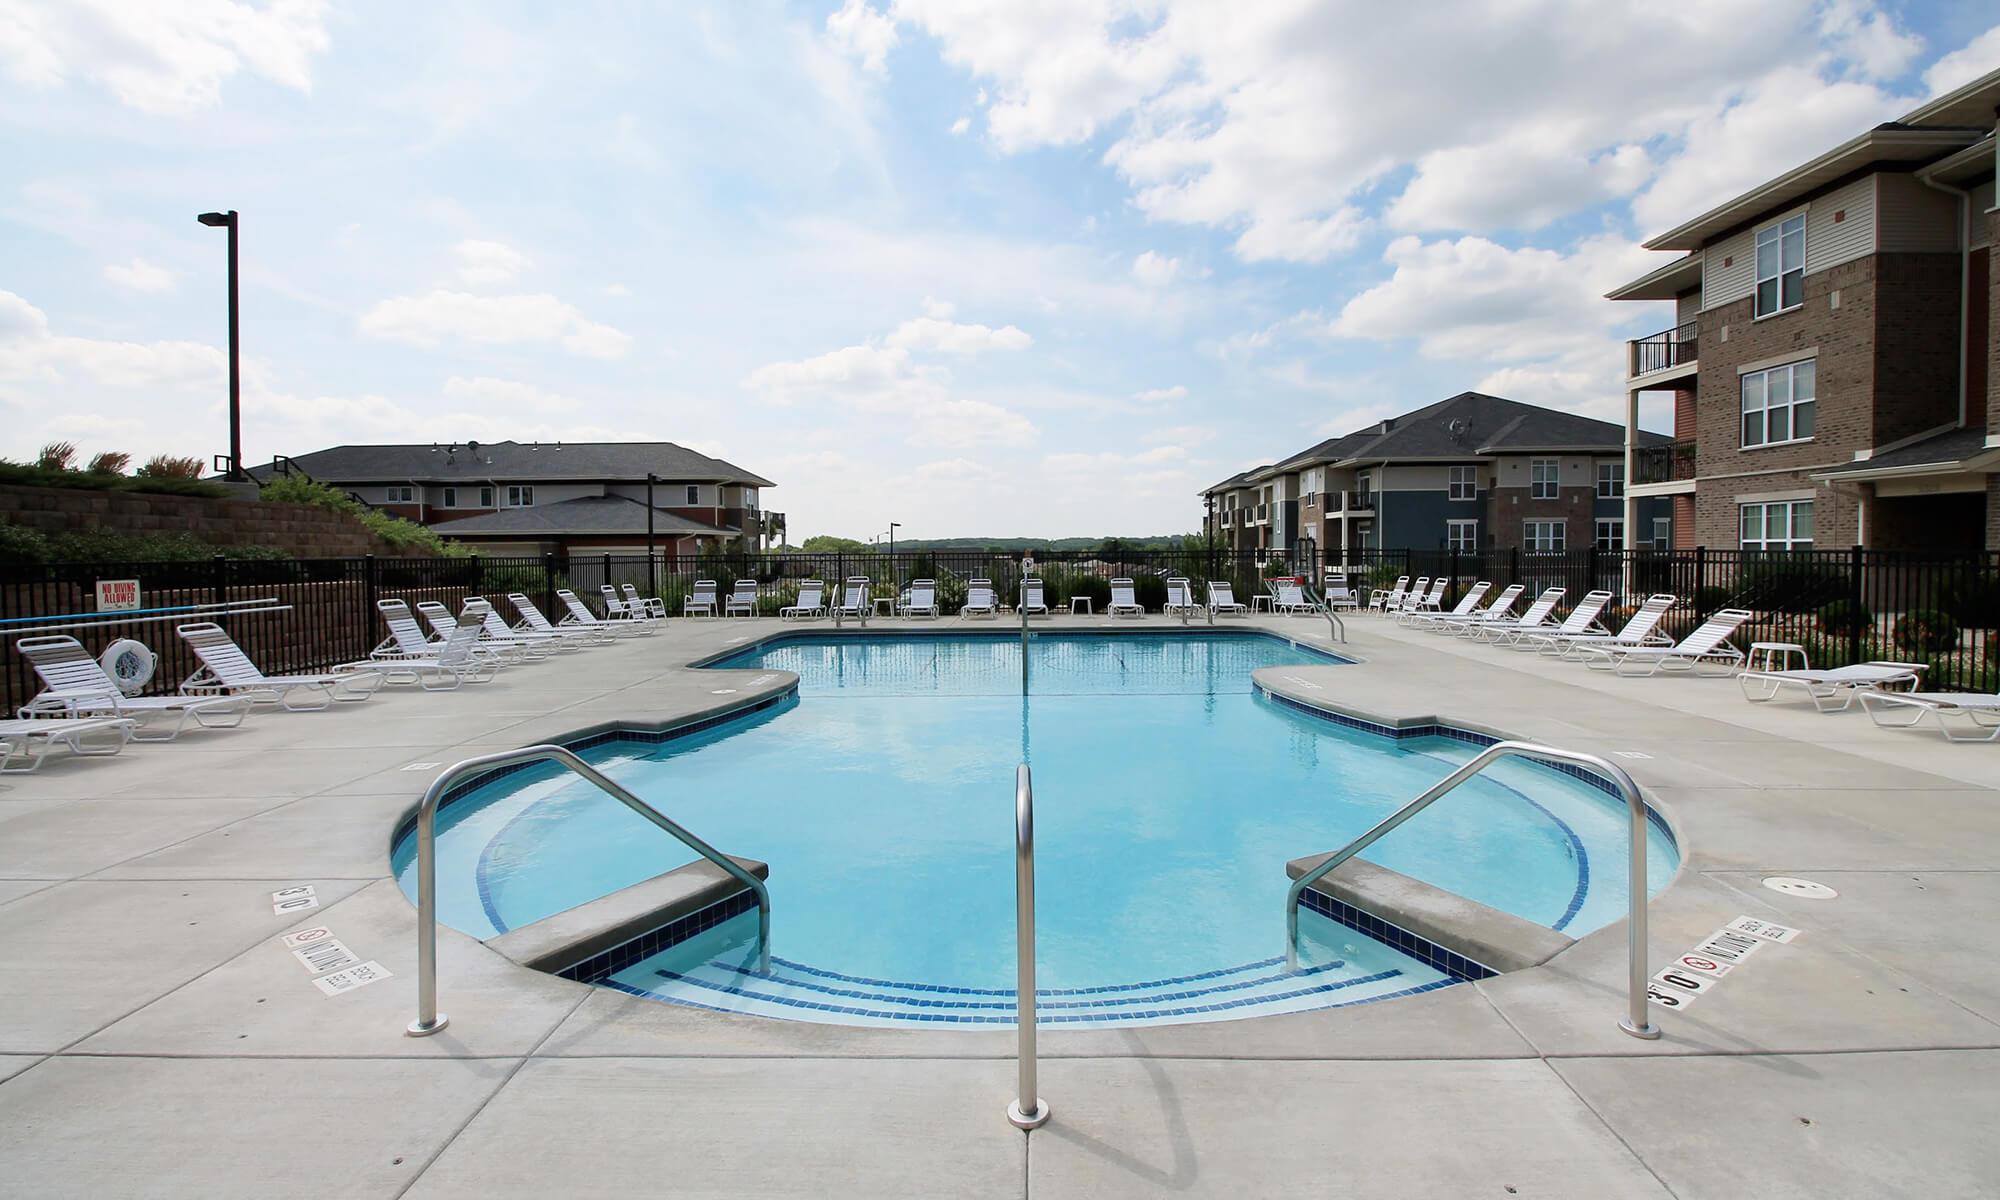 Lower Pool 2